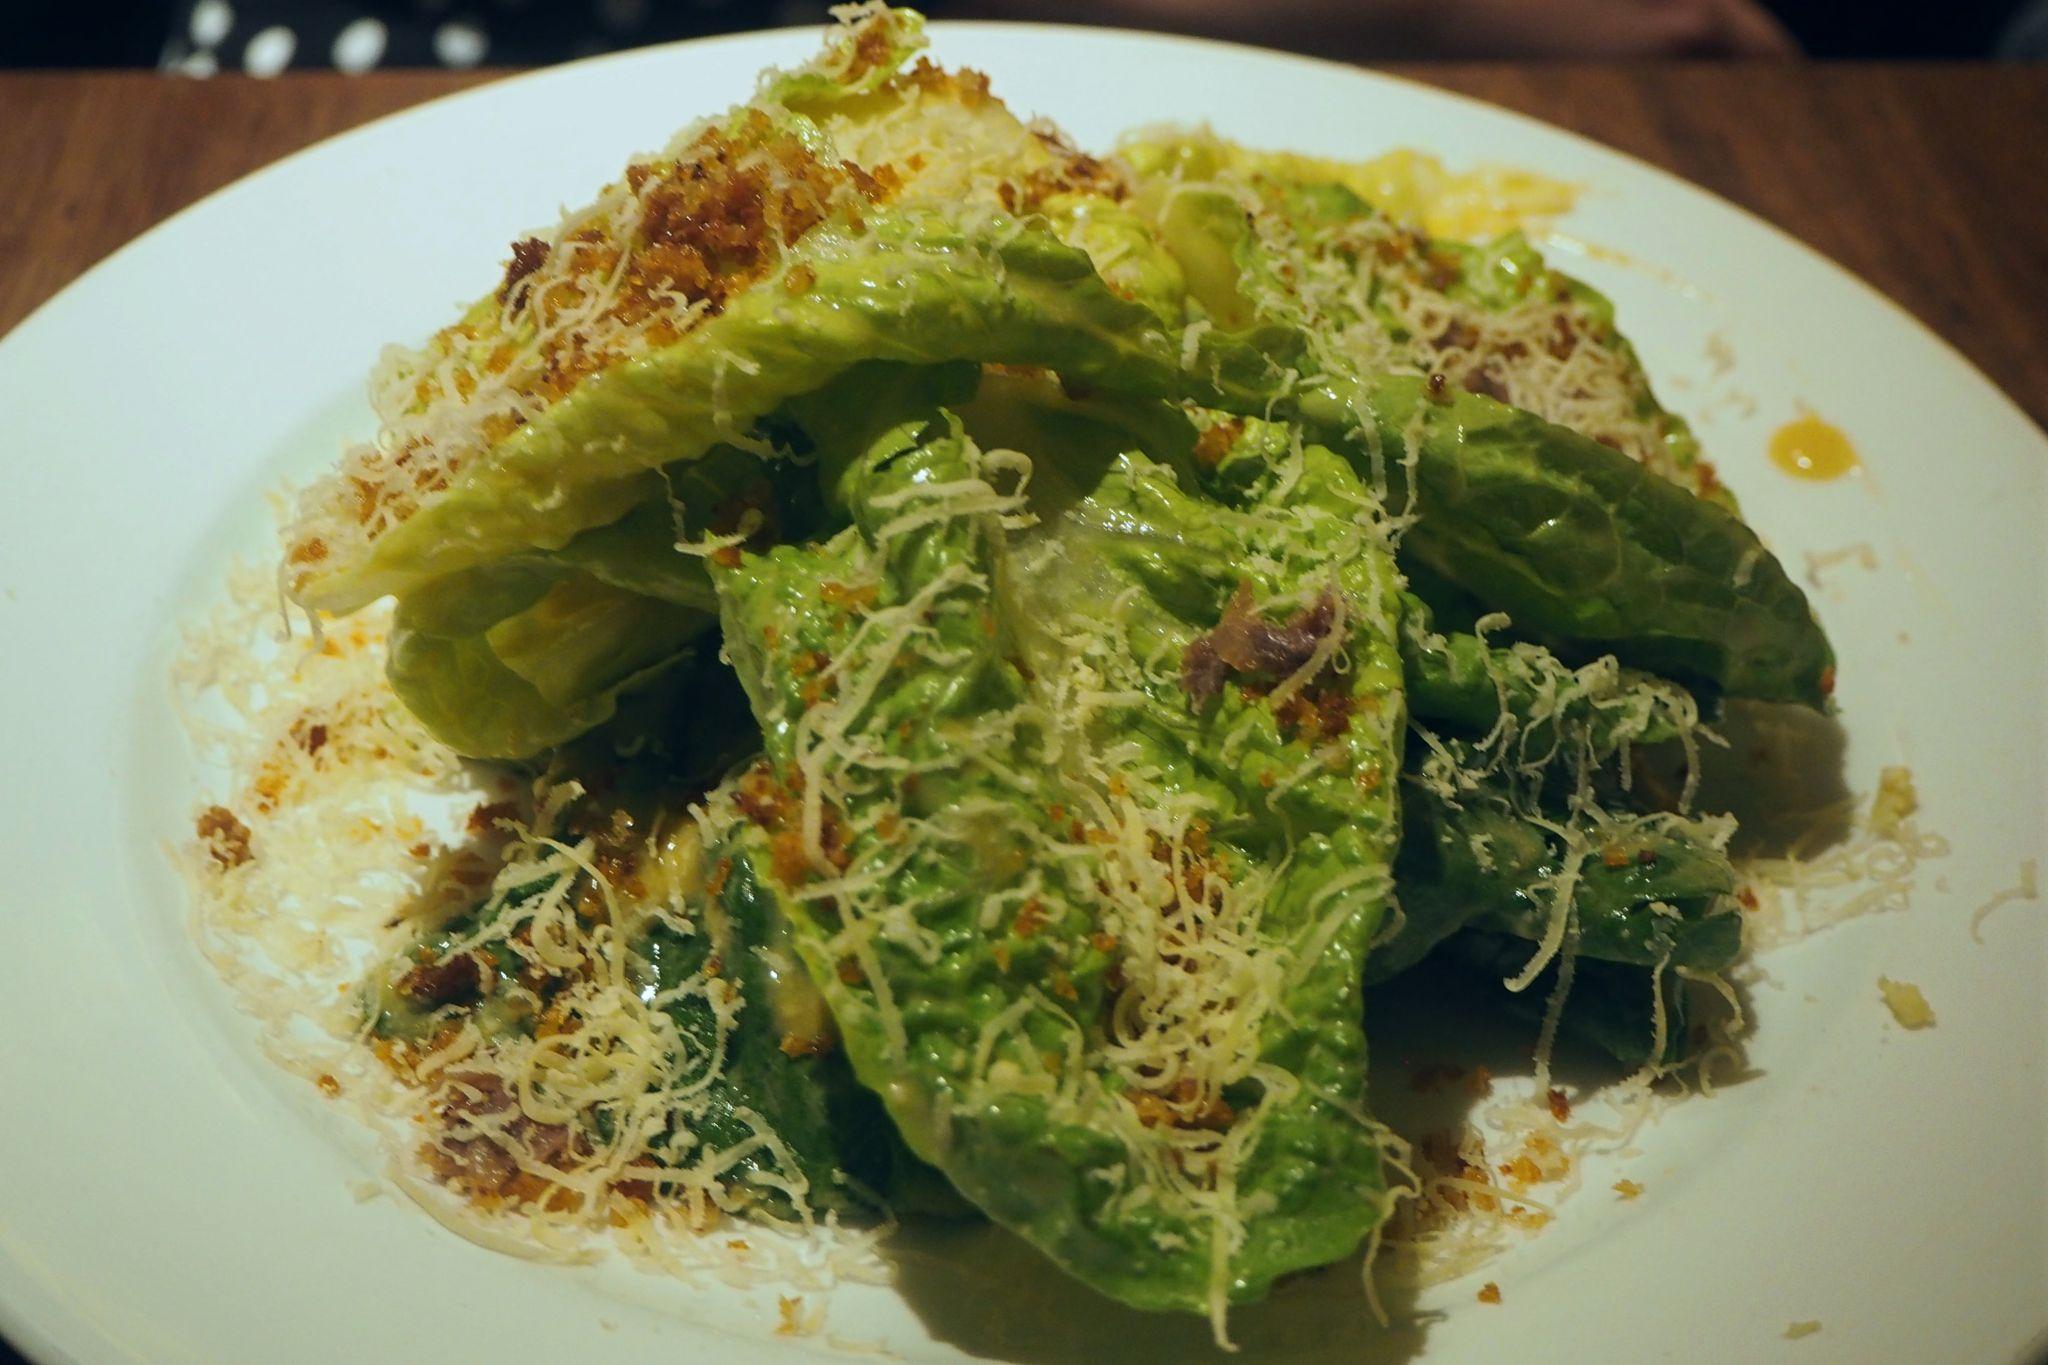 Doddington Ceasar Salad